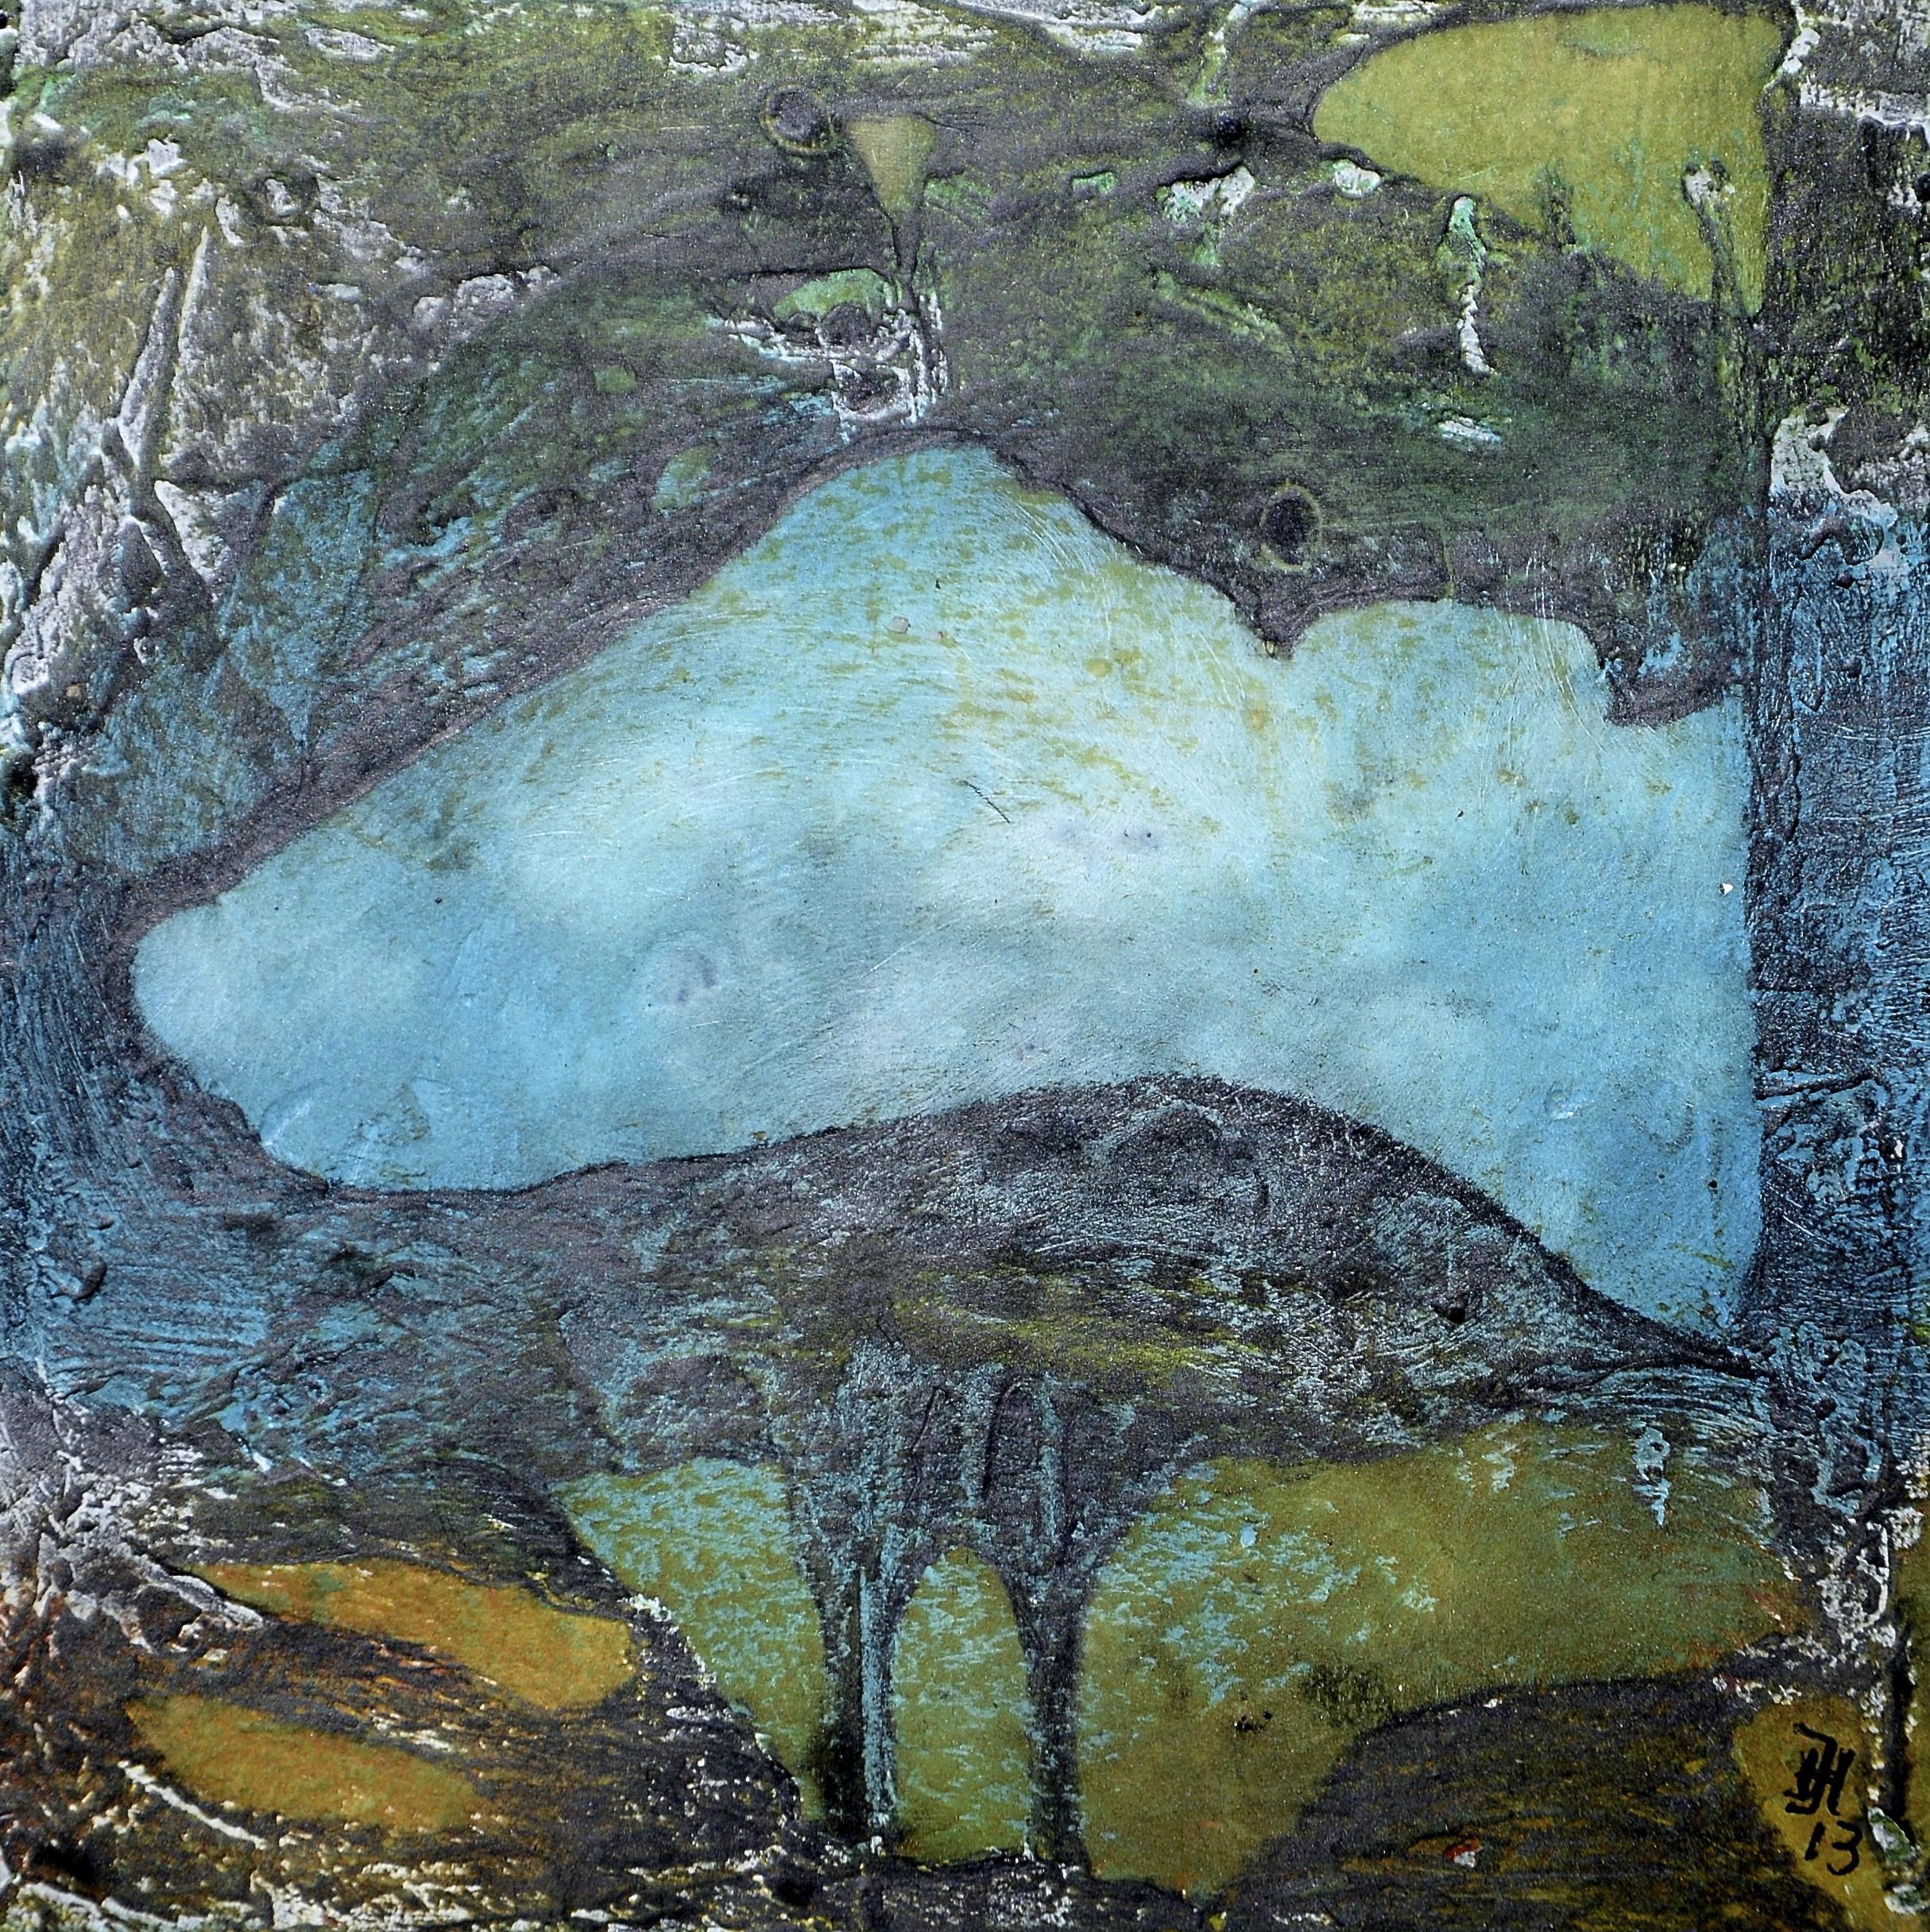 höhle_,acryl_auf_MDF,15x15cm,2013am_meer.JPG